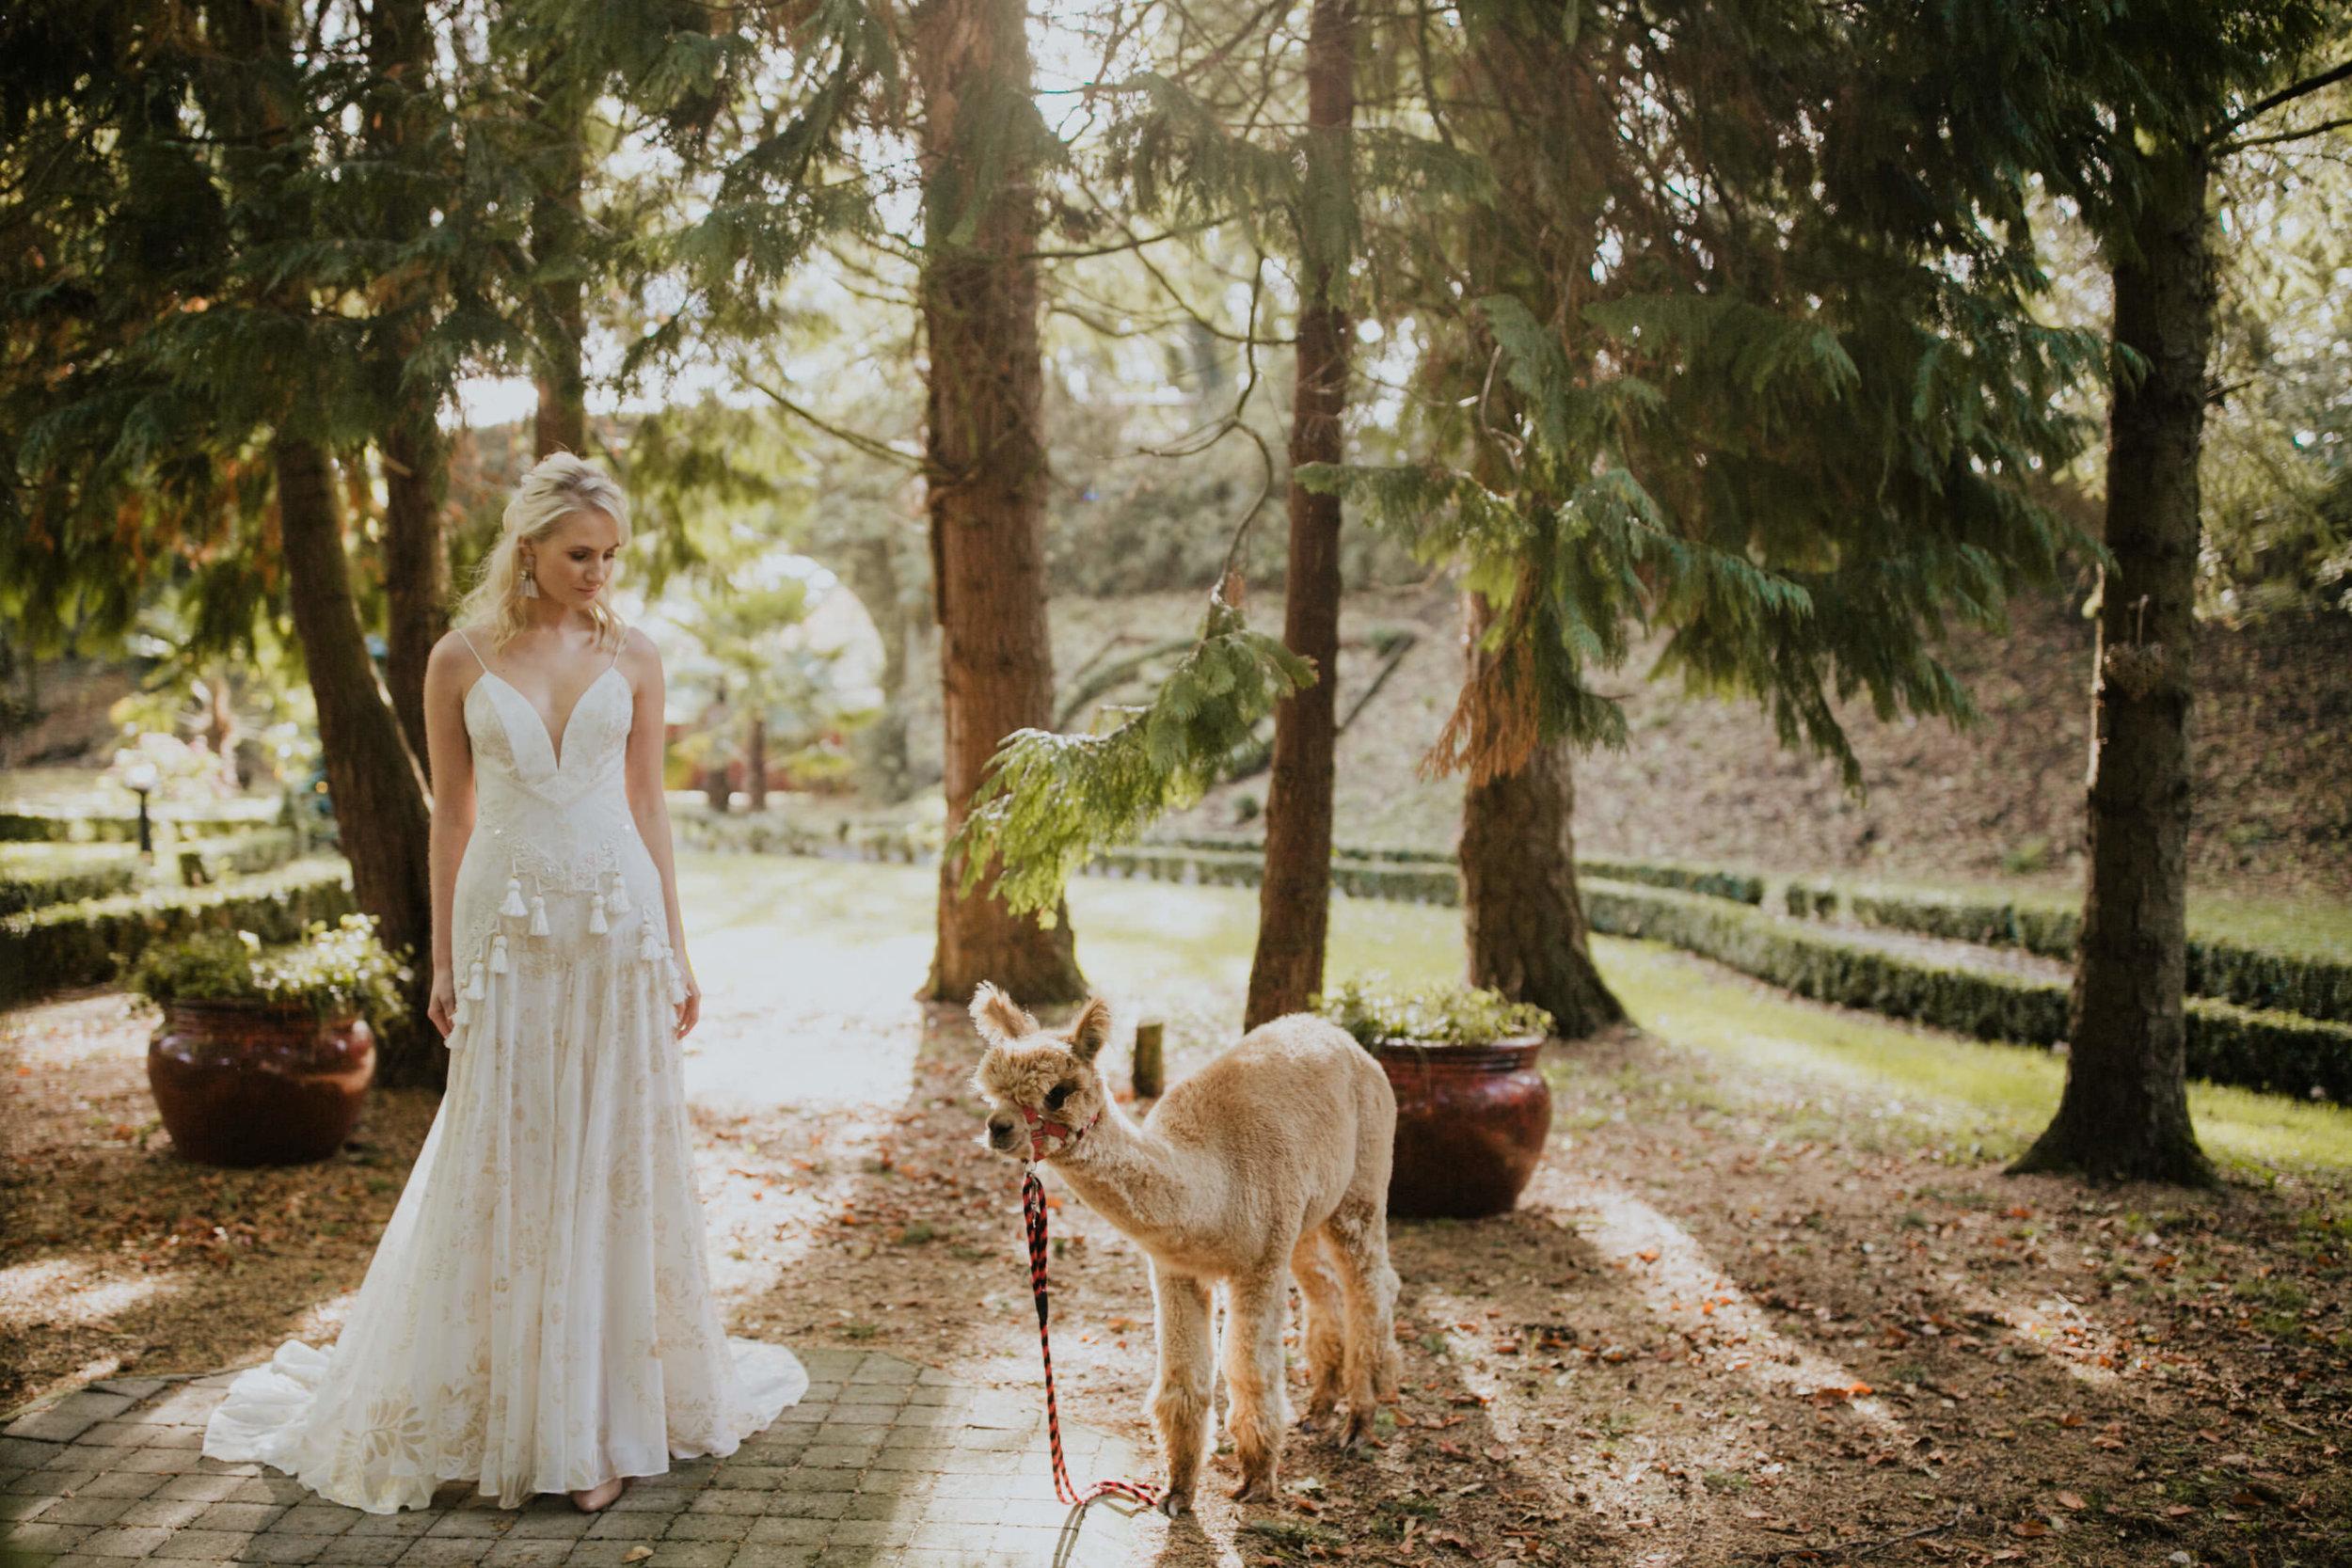 boho_wedding_alpaca_xpose_station_house_livia_figueiredo_photography_14.jpg